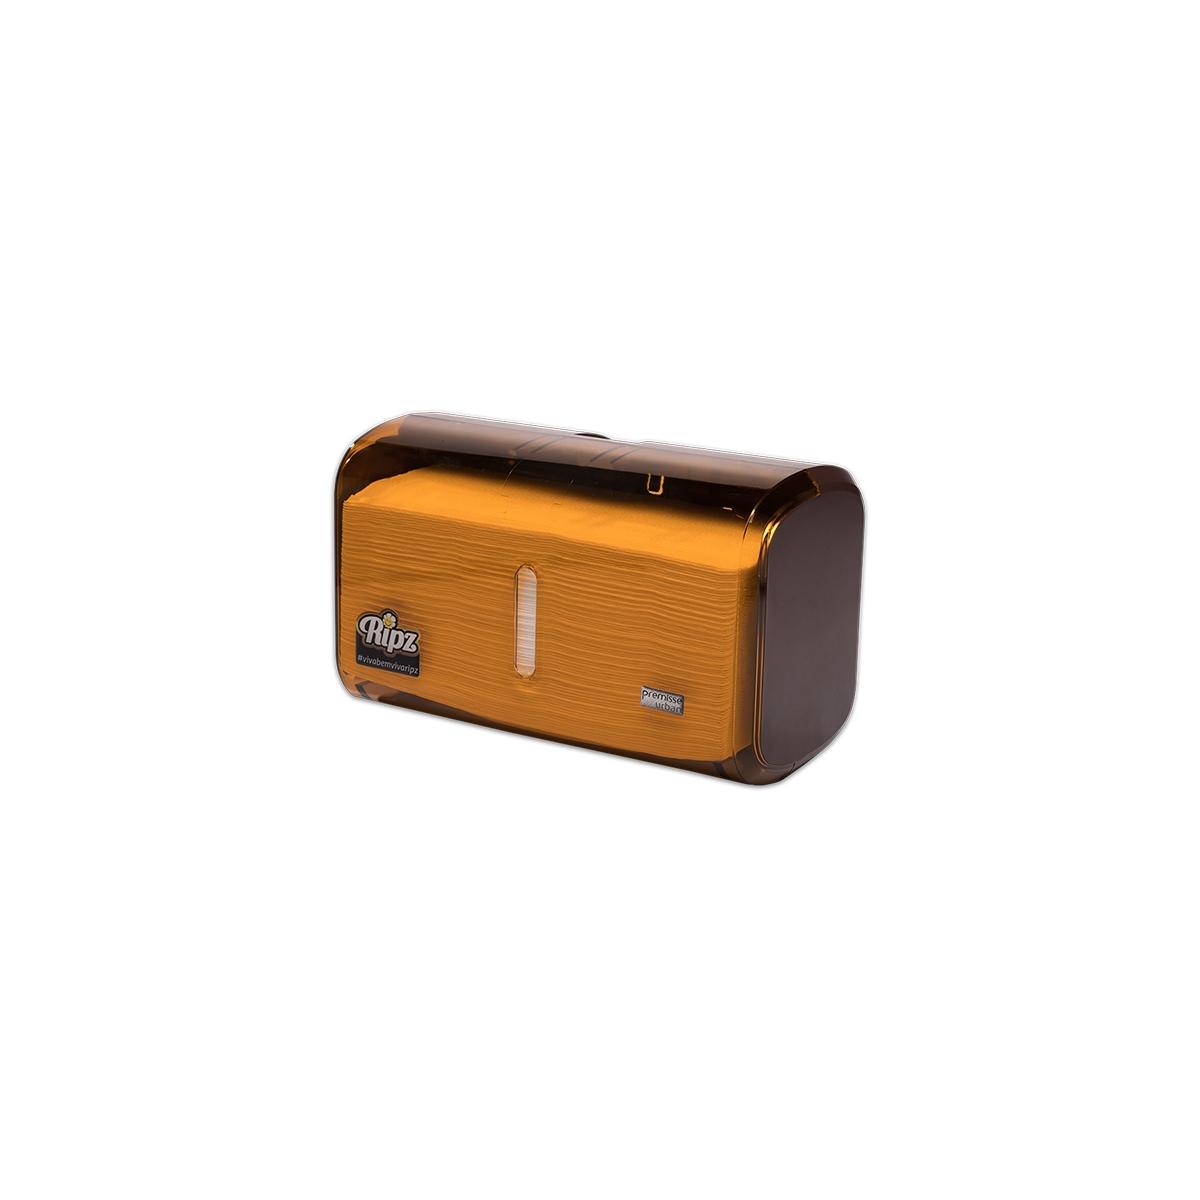 CÓD. 19823 - Dispenser Toalha Interfolha Compacto - MARRON